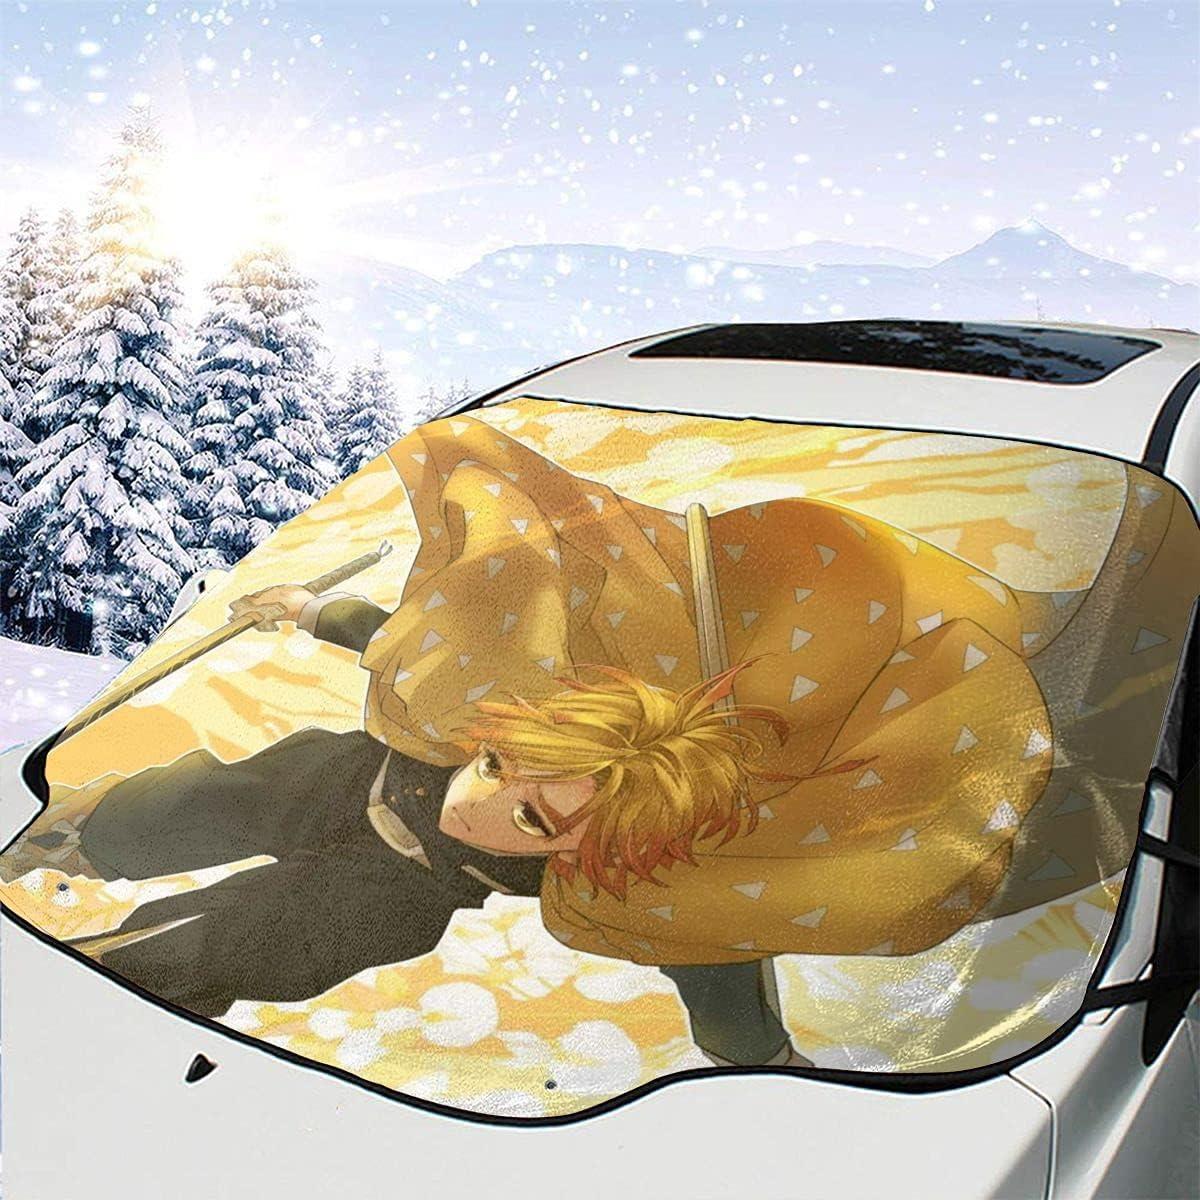 Awhgbnl Ds Zenitsu Anime Car Manga Ranking TOP15 Cover Snow Topics on TV Design Windshield